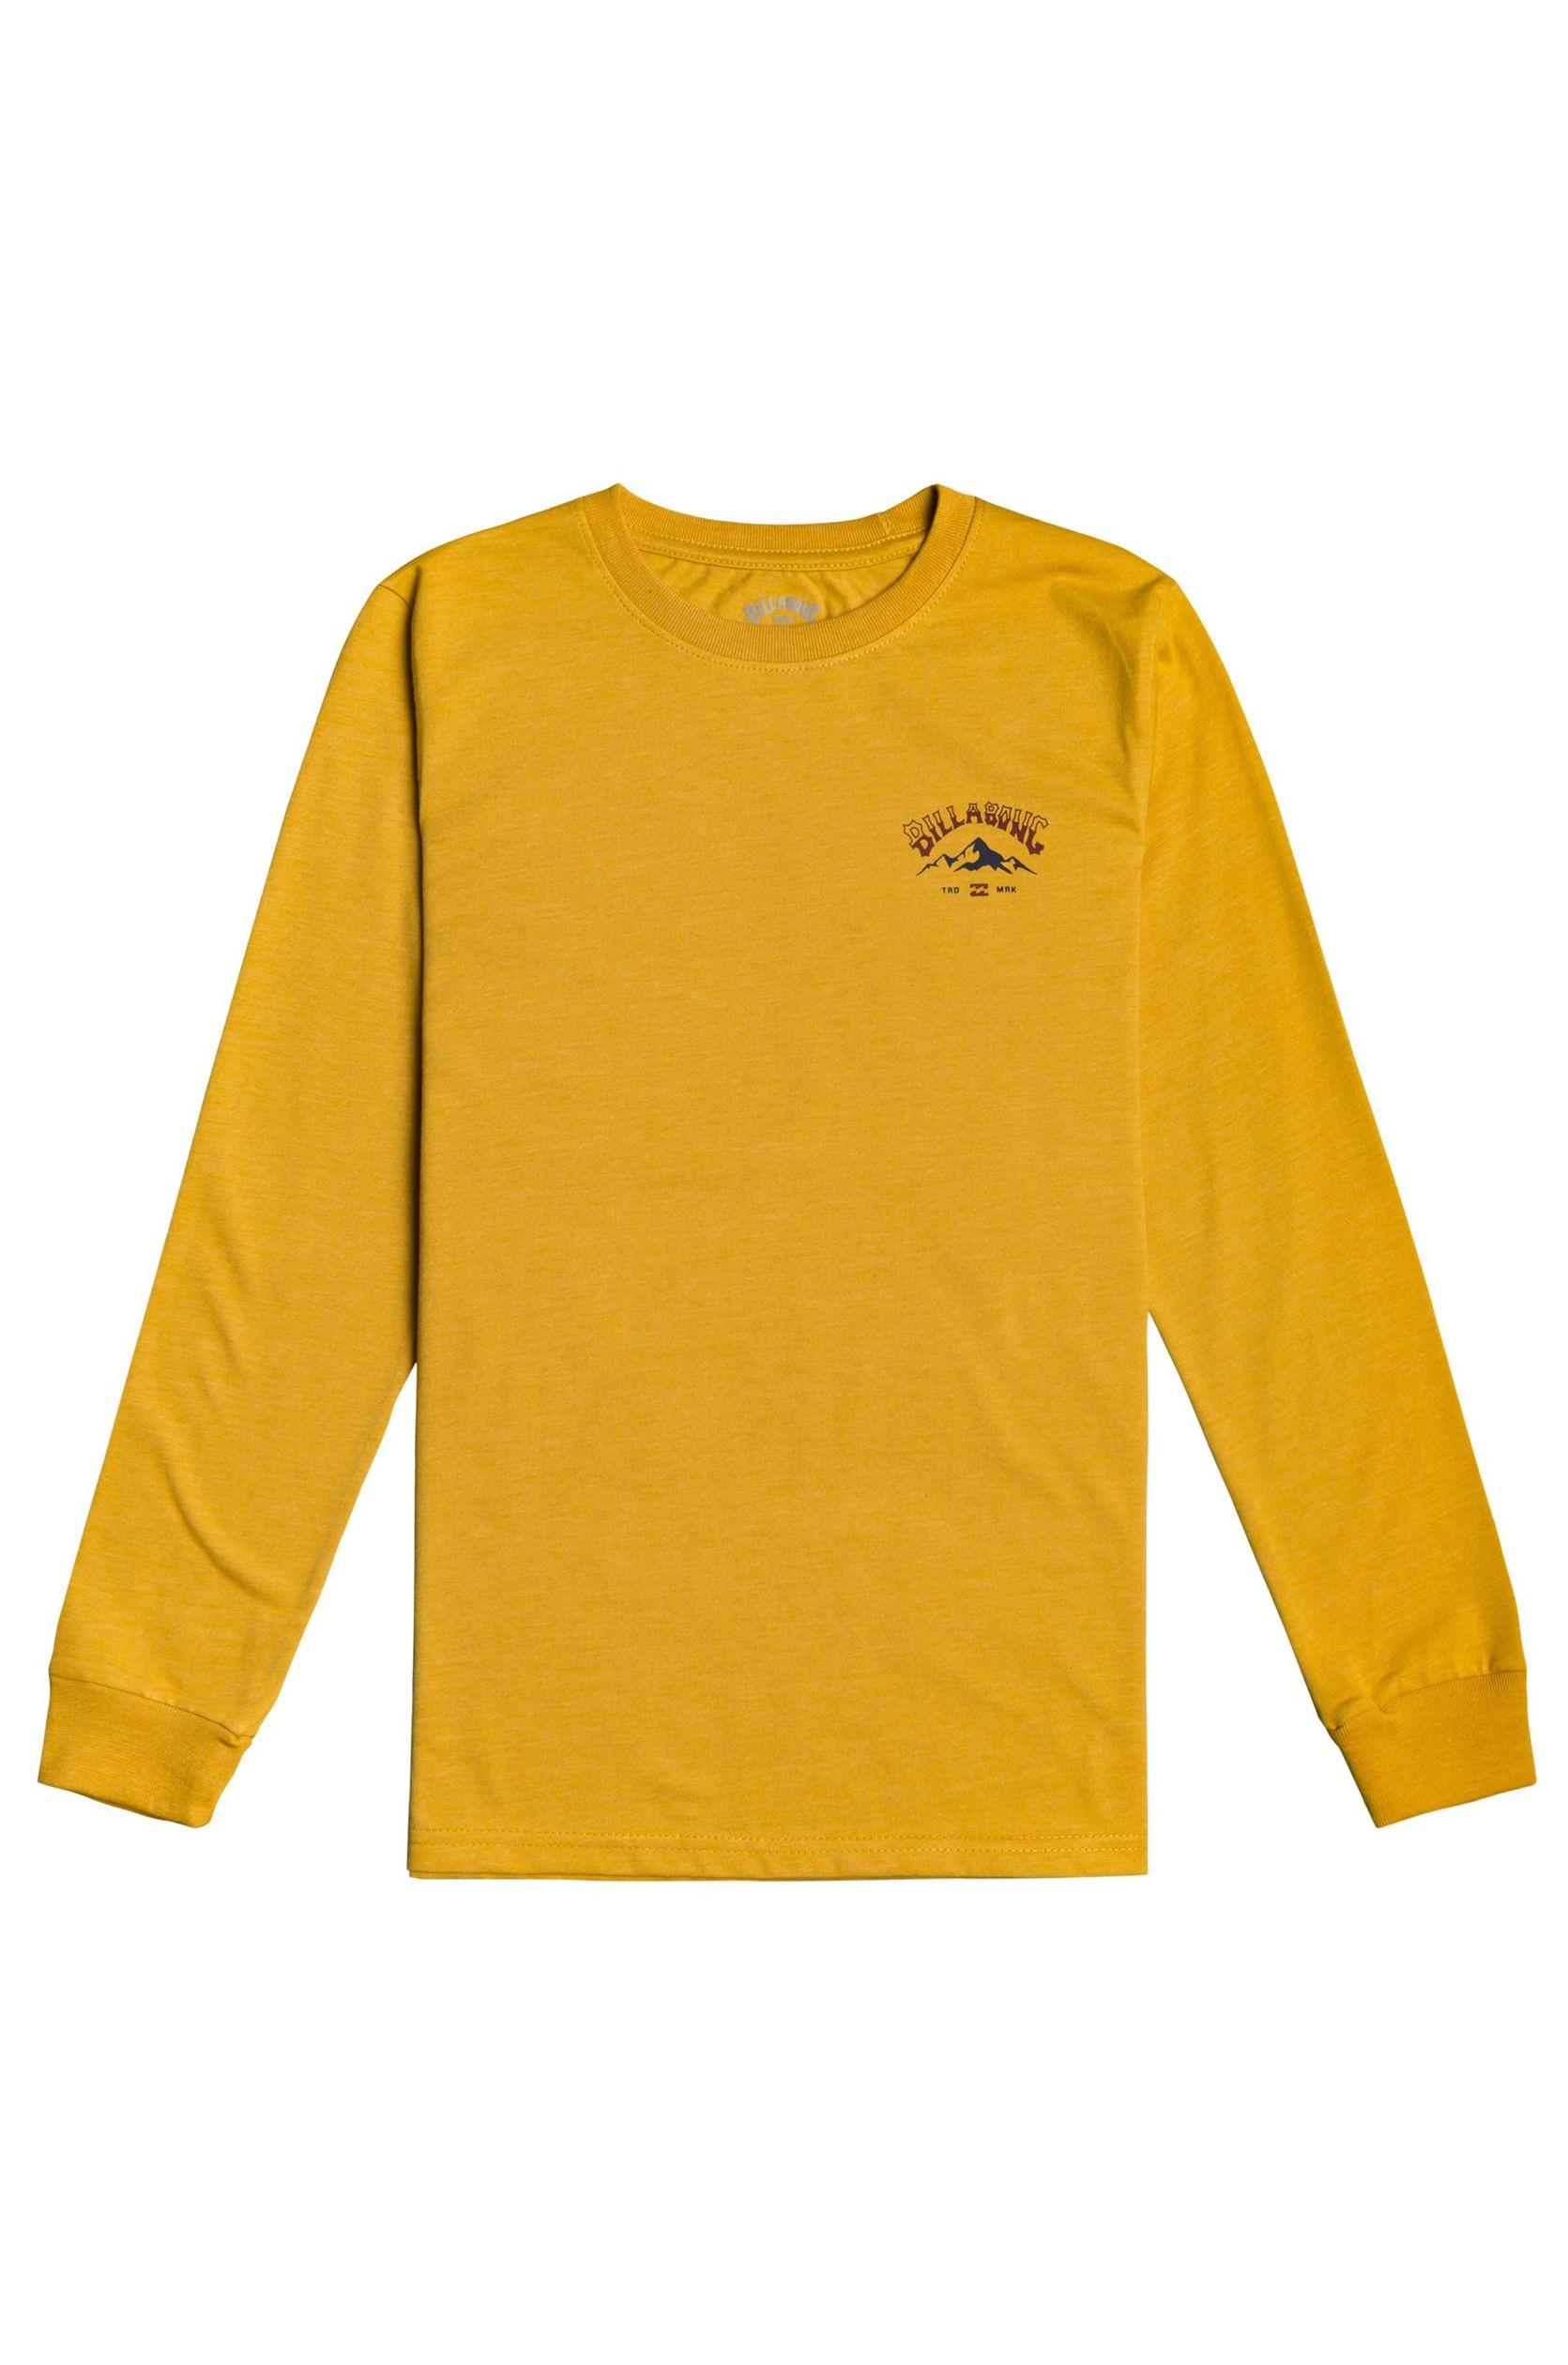 L-Sleeve Billabong ARCH PEAK LS BOY Mustard